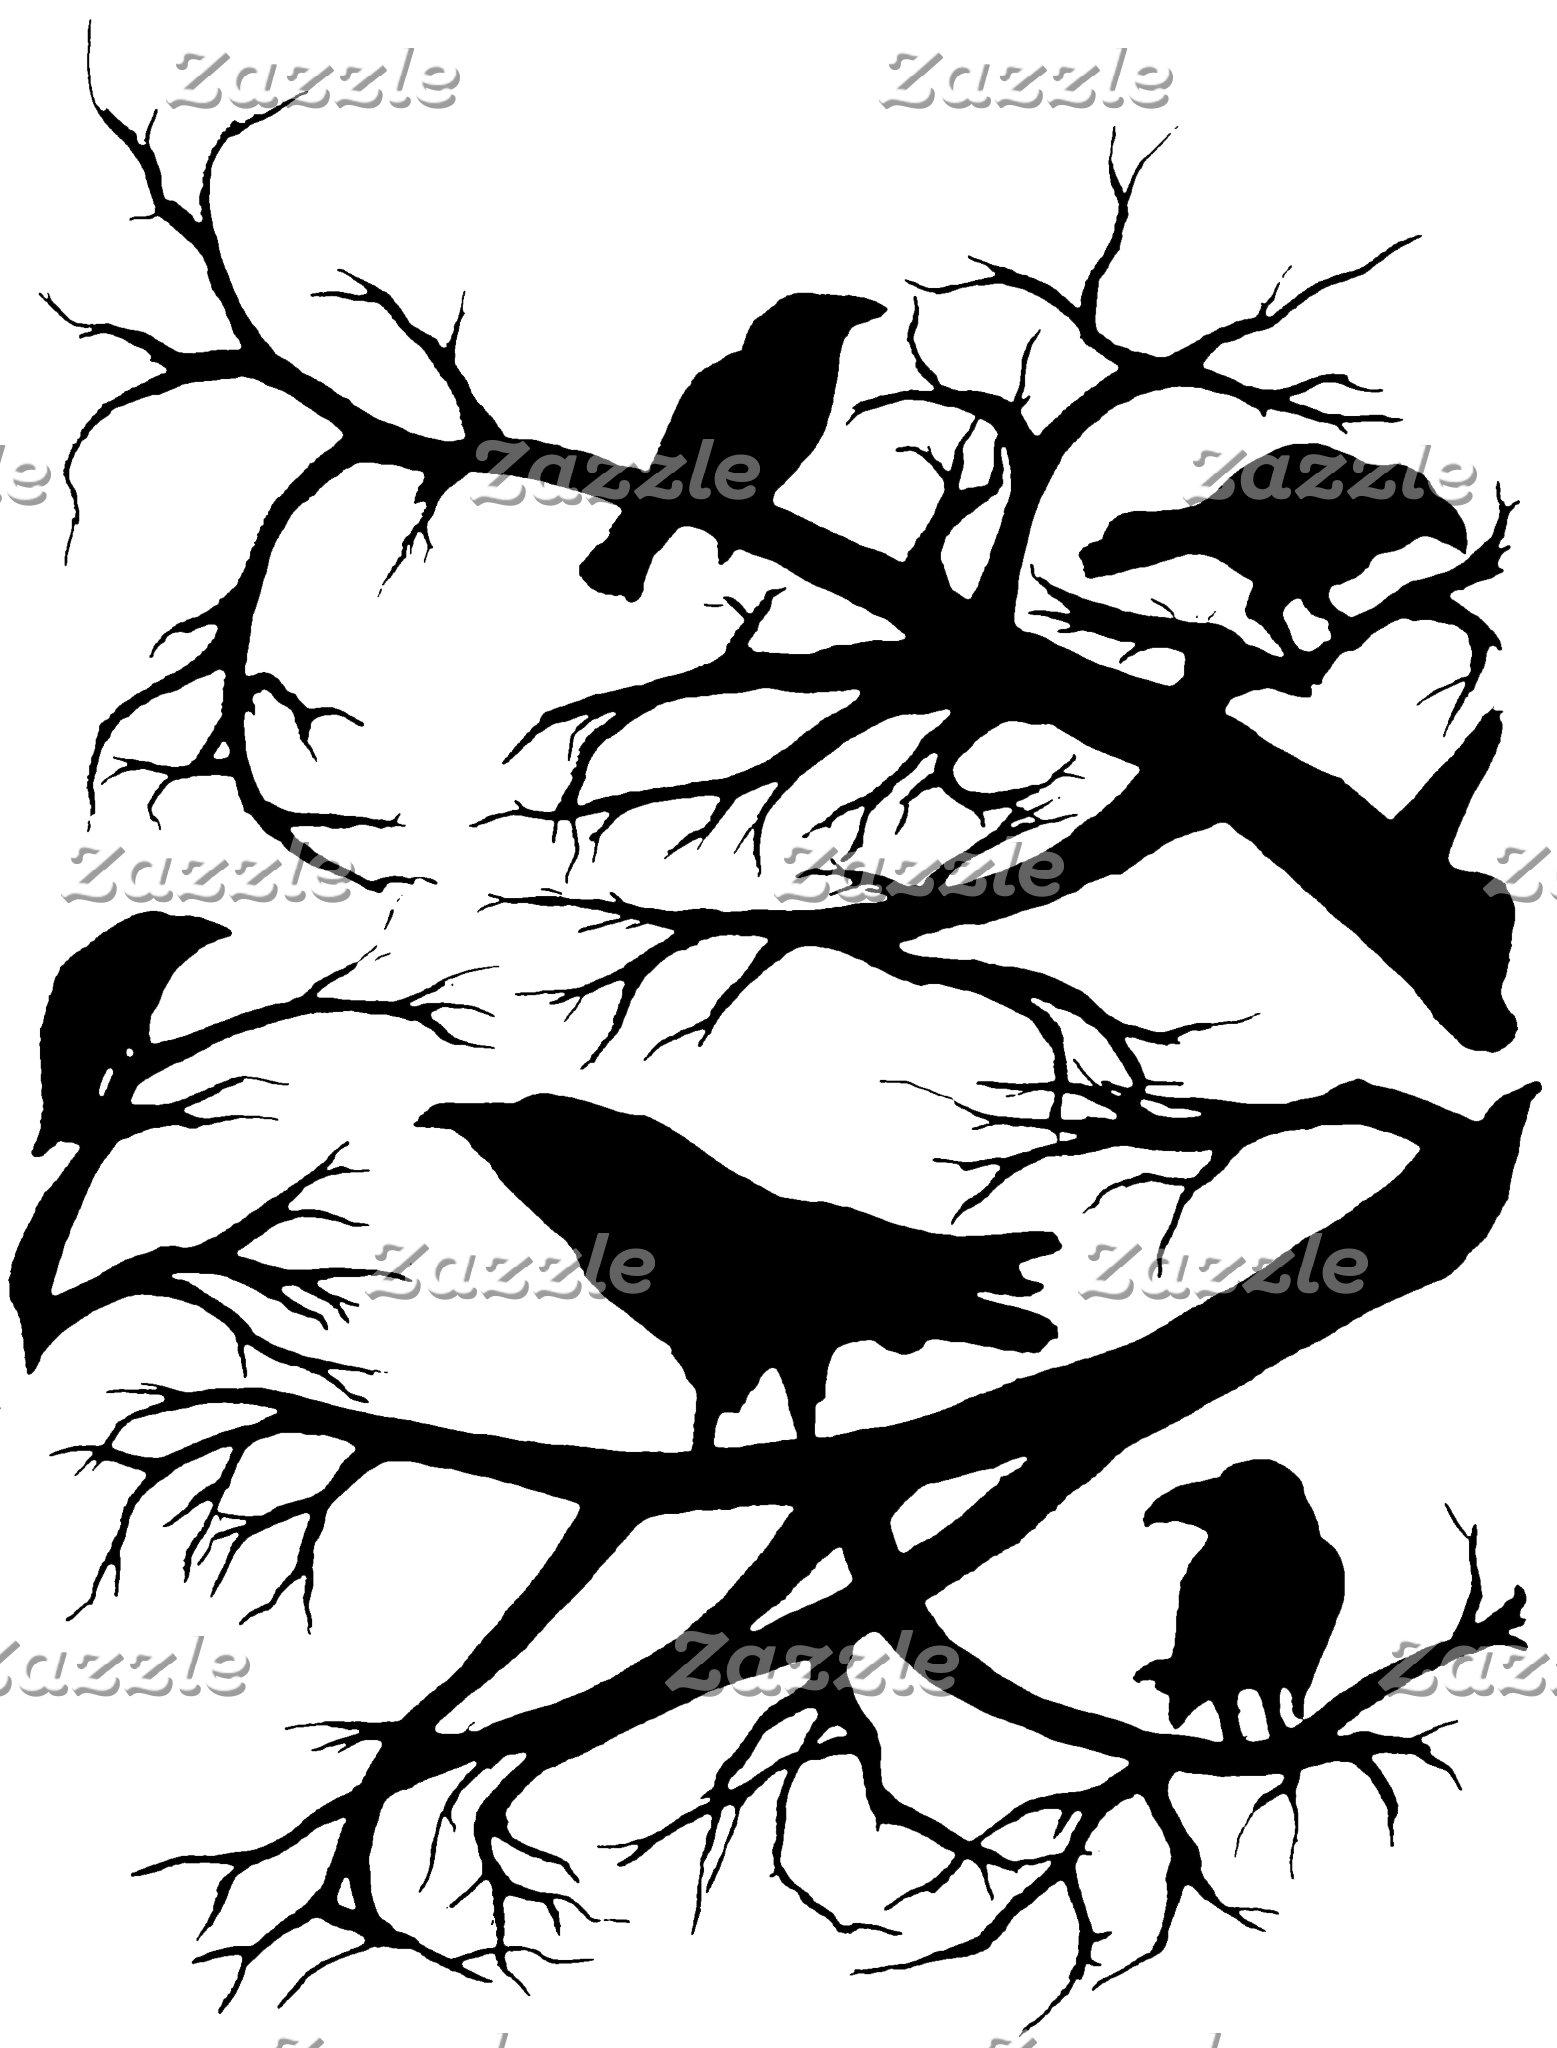 Corvidae, Corvus brachyrhynchos or Crow